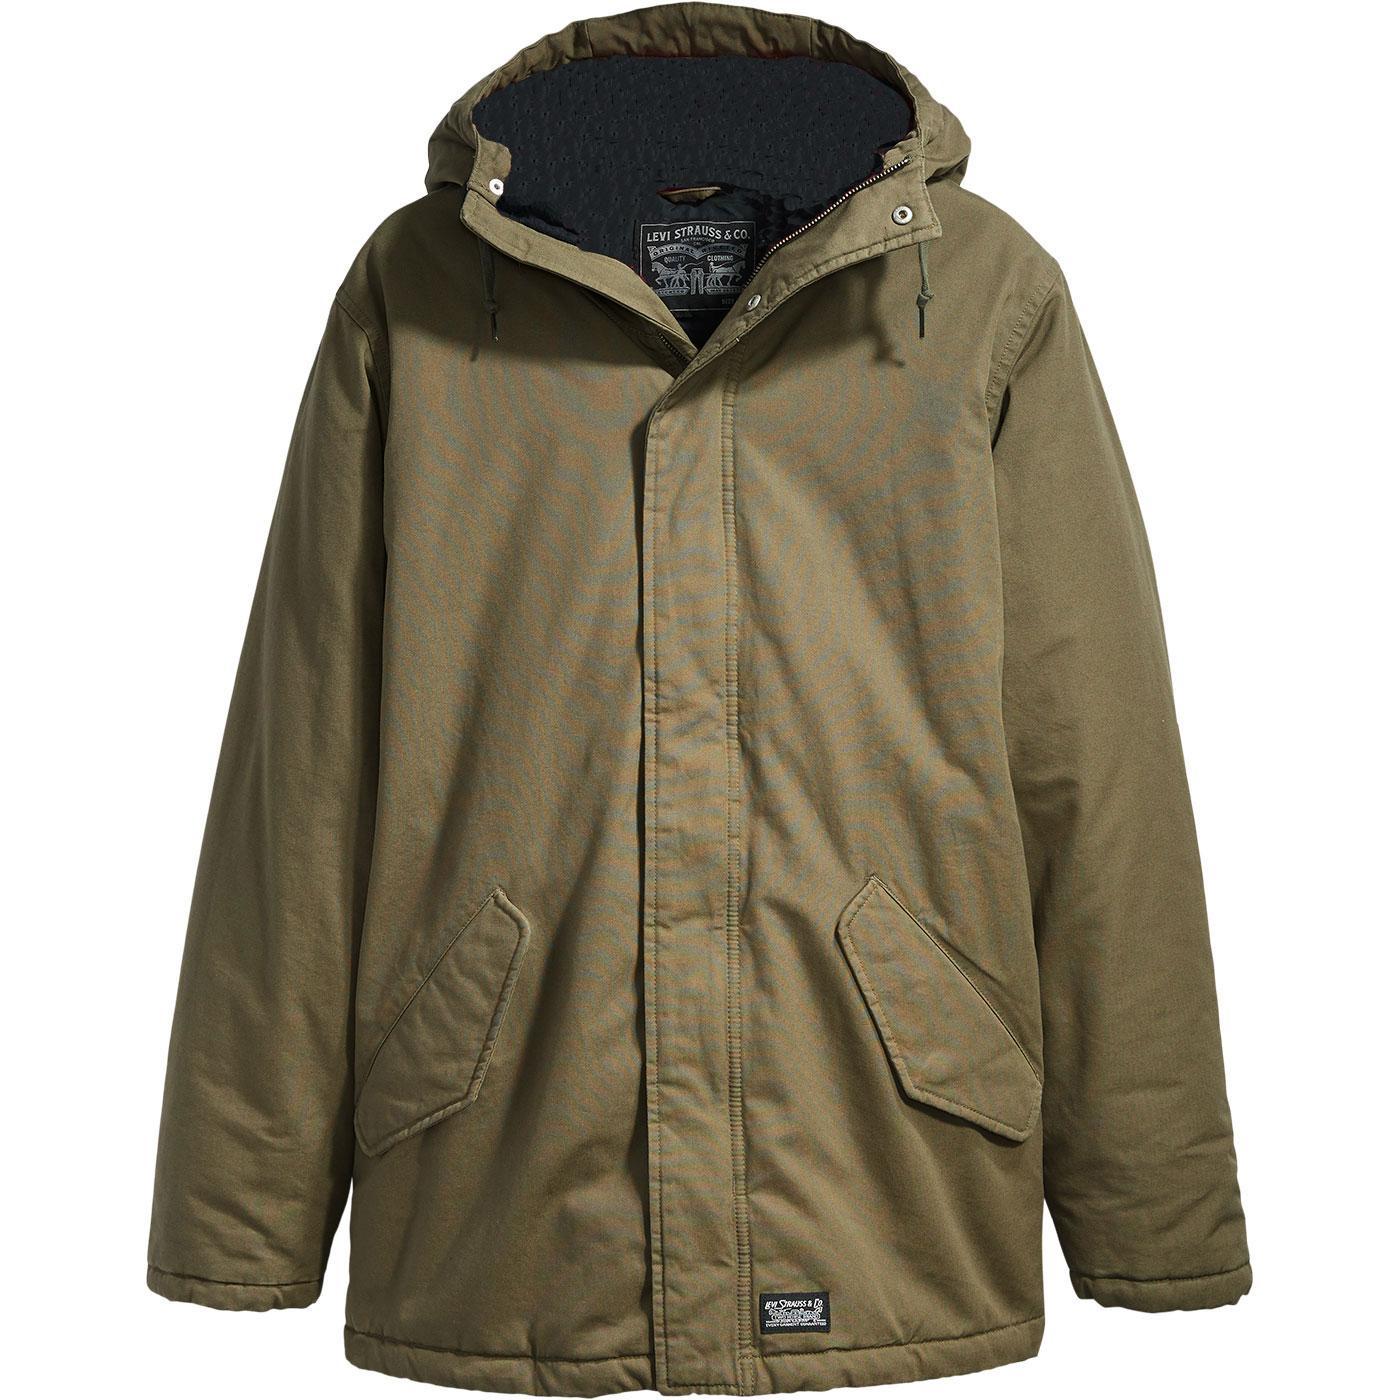 LEVI'S Men's Mod Thermore Padded Parka Jacket (ON)